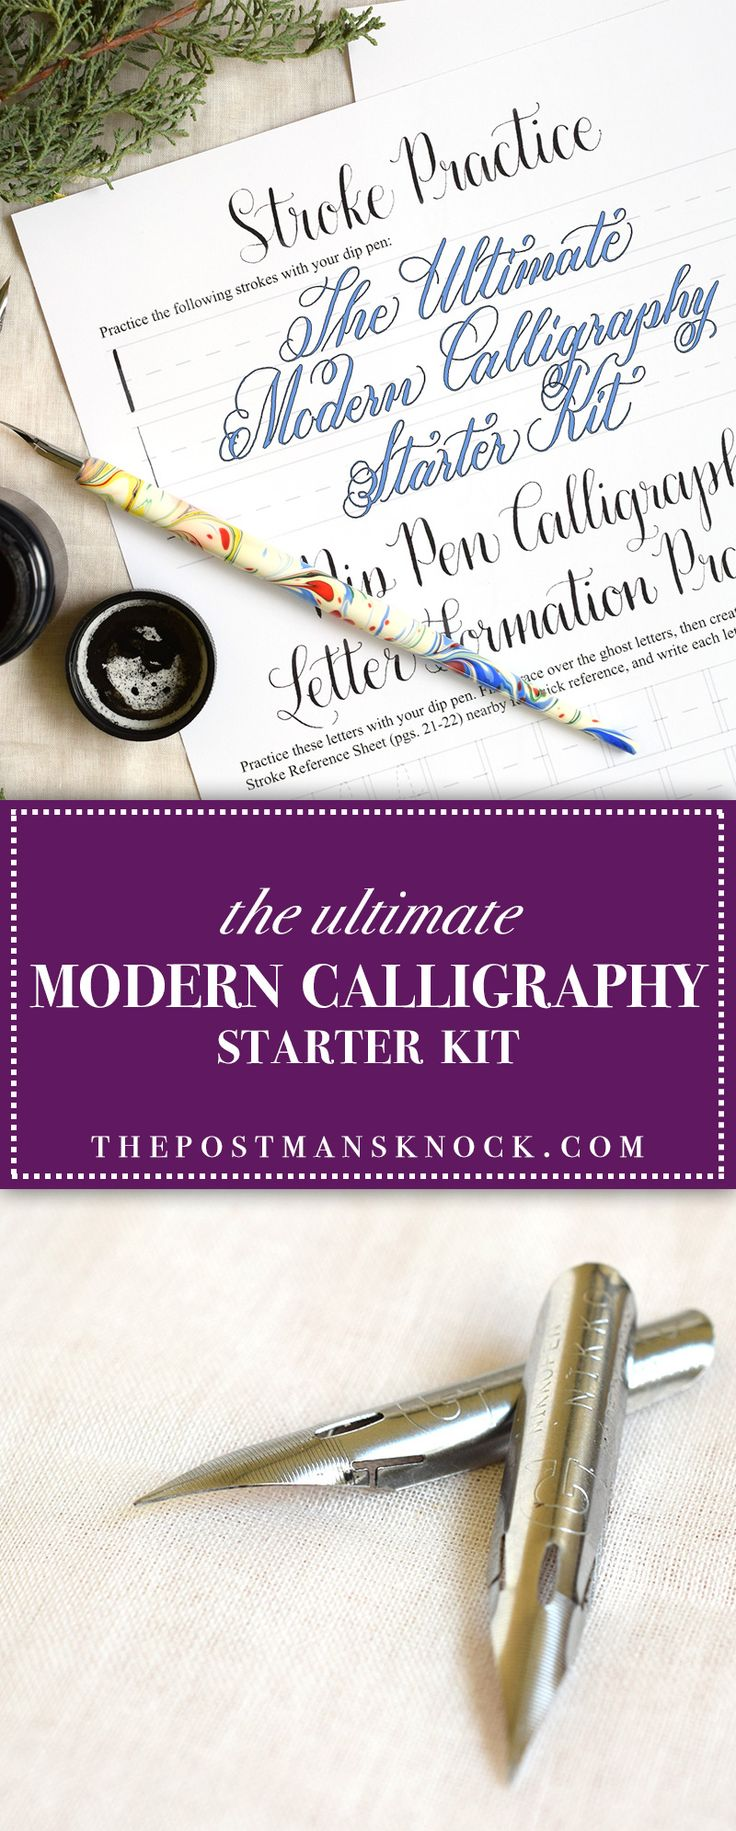 The Ultimate Modern Calligraphy Starter Kit